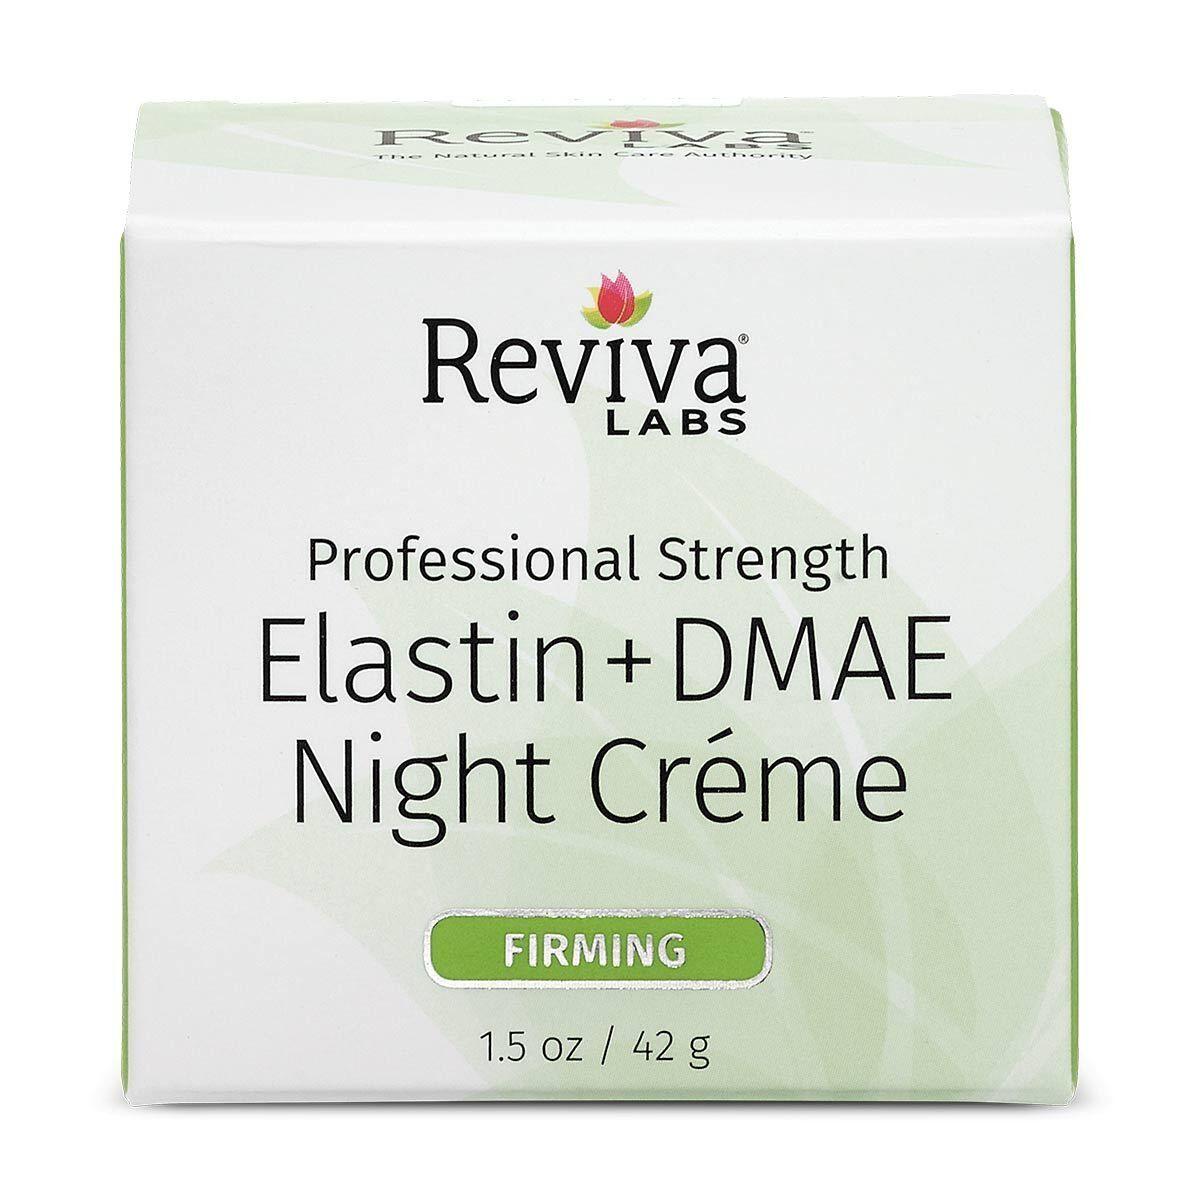 Reviva - Elastin + DMAE Night Creme